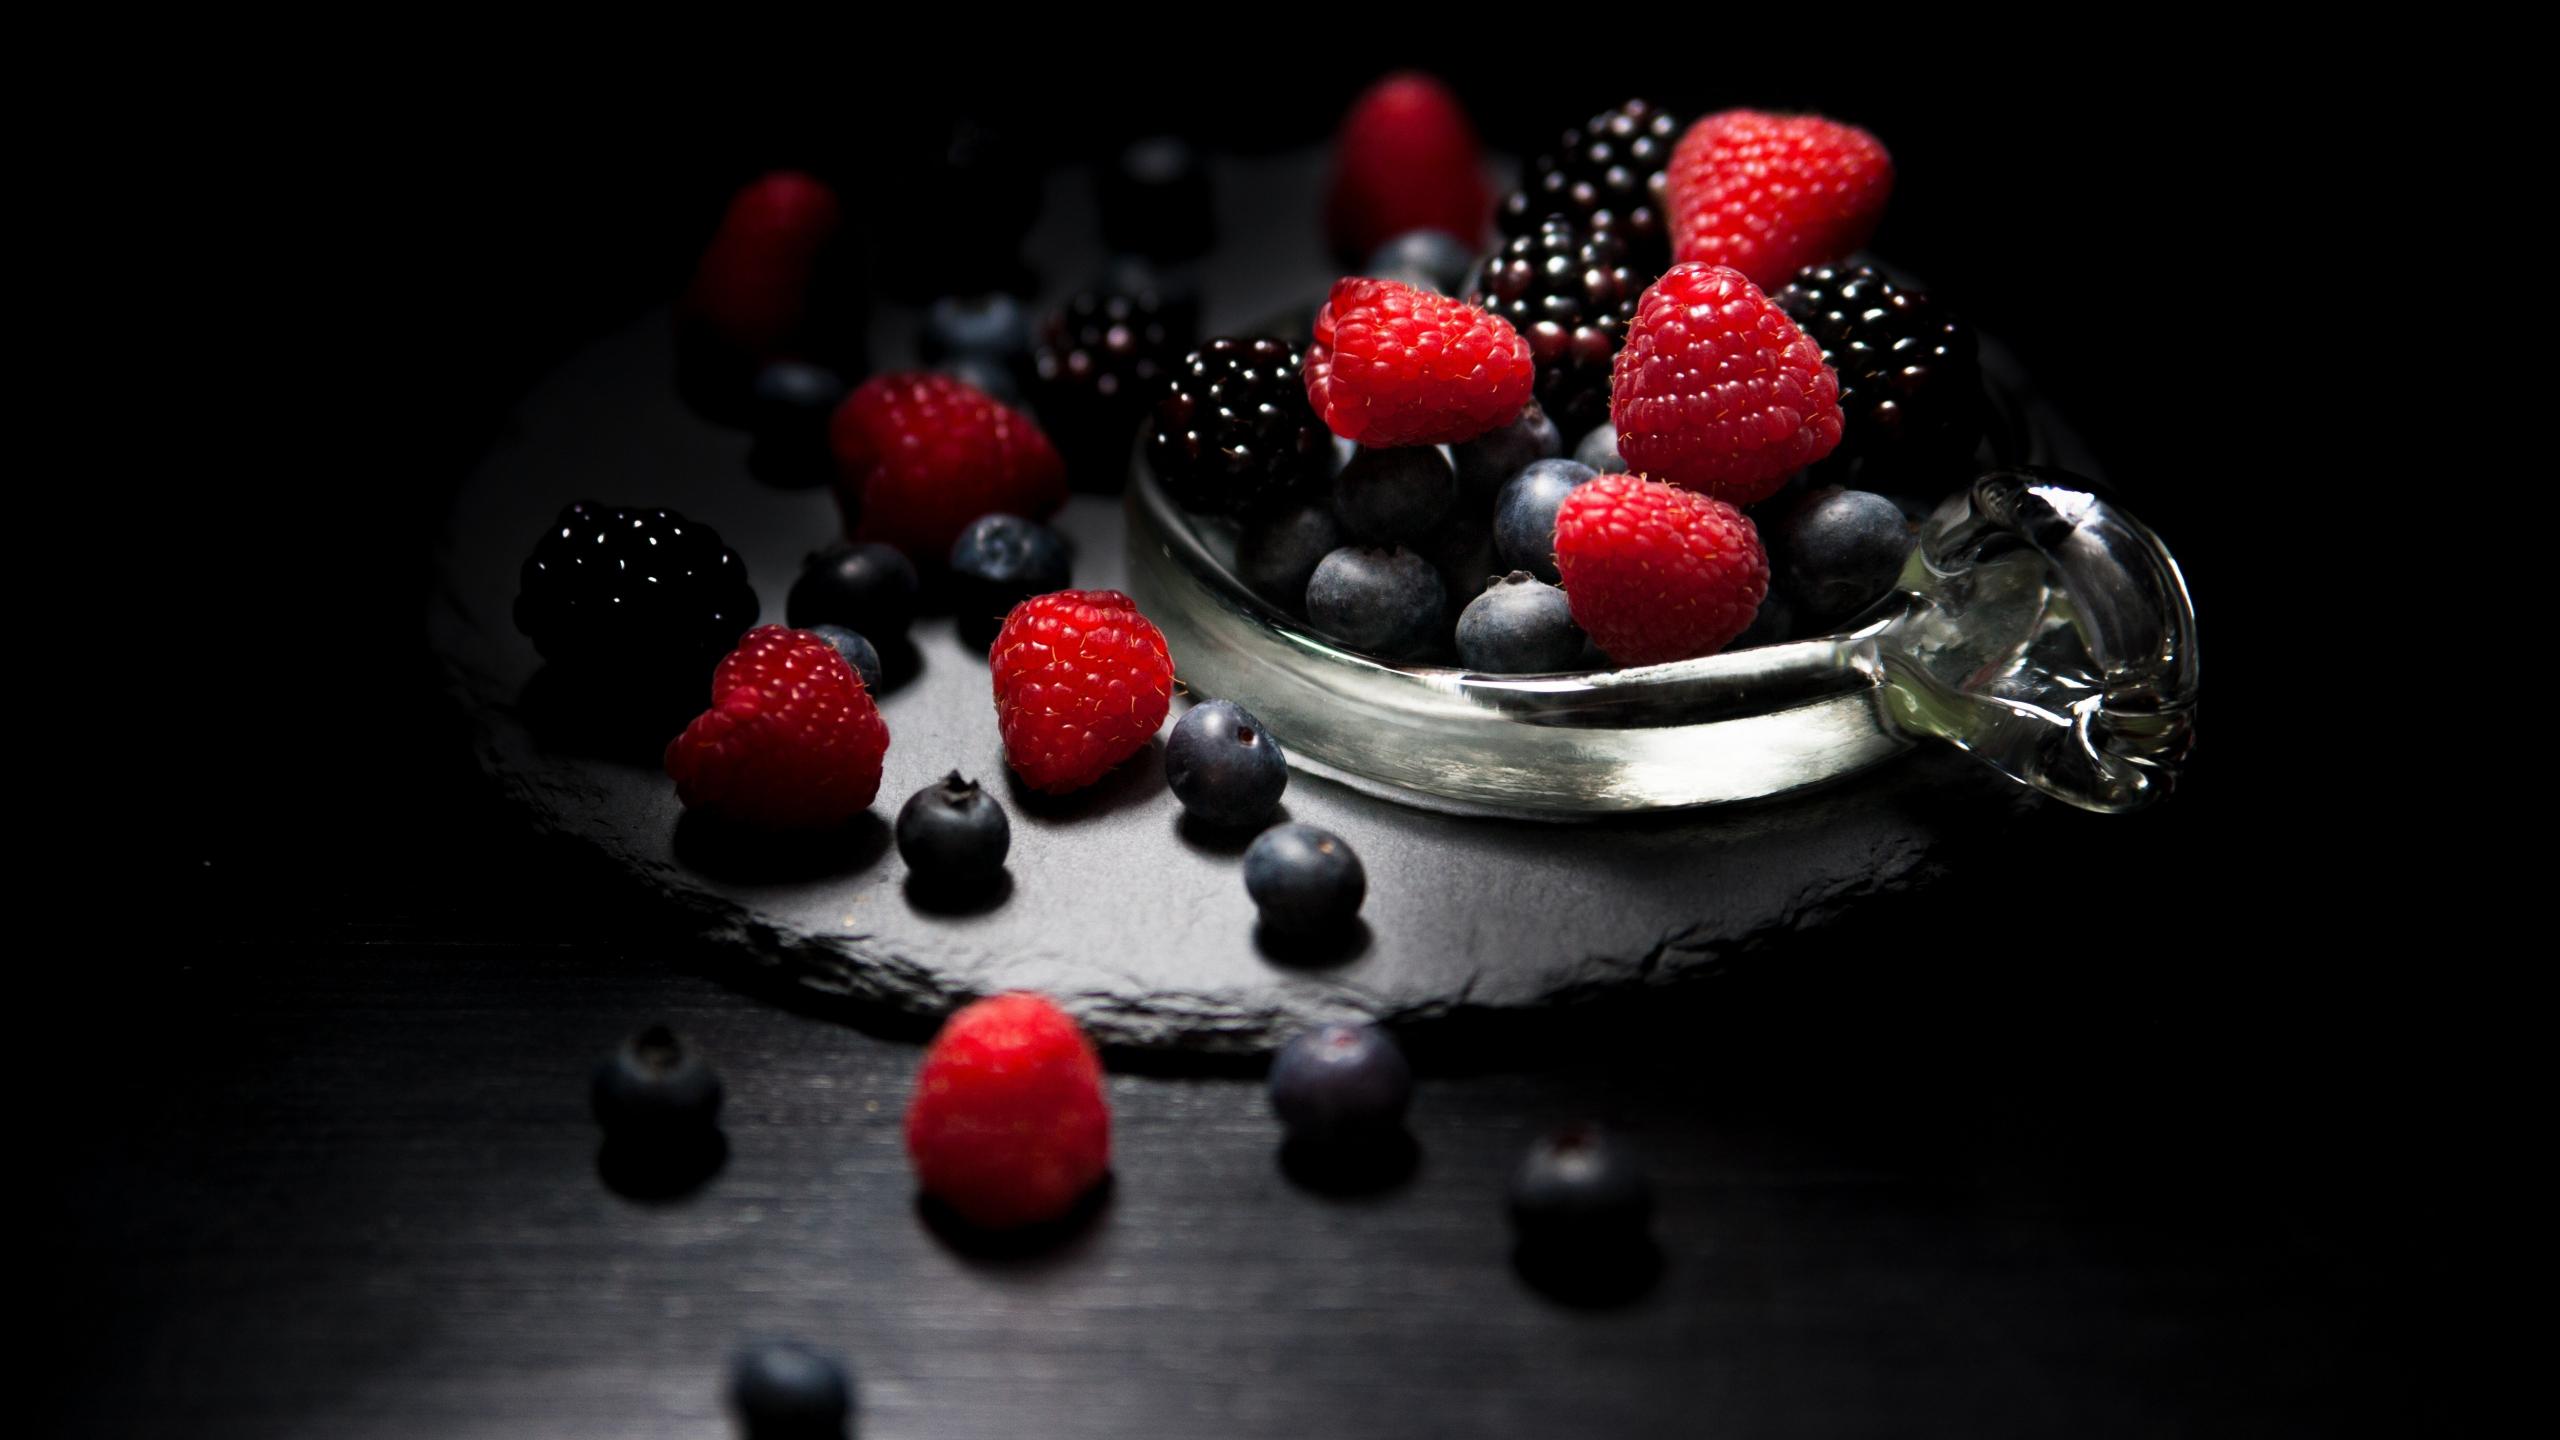 Dark mood, food, fruits, Raspberry, blueberry, Blackberry, 2560x1440 wallpaper